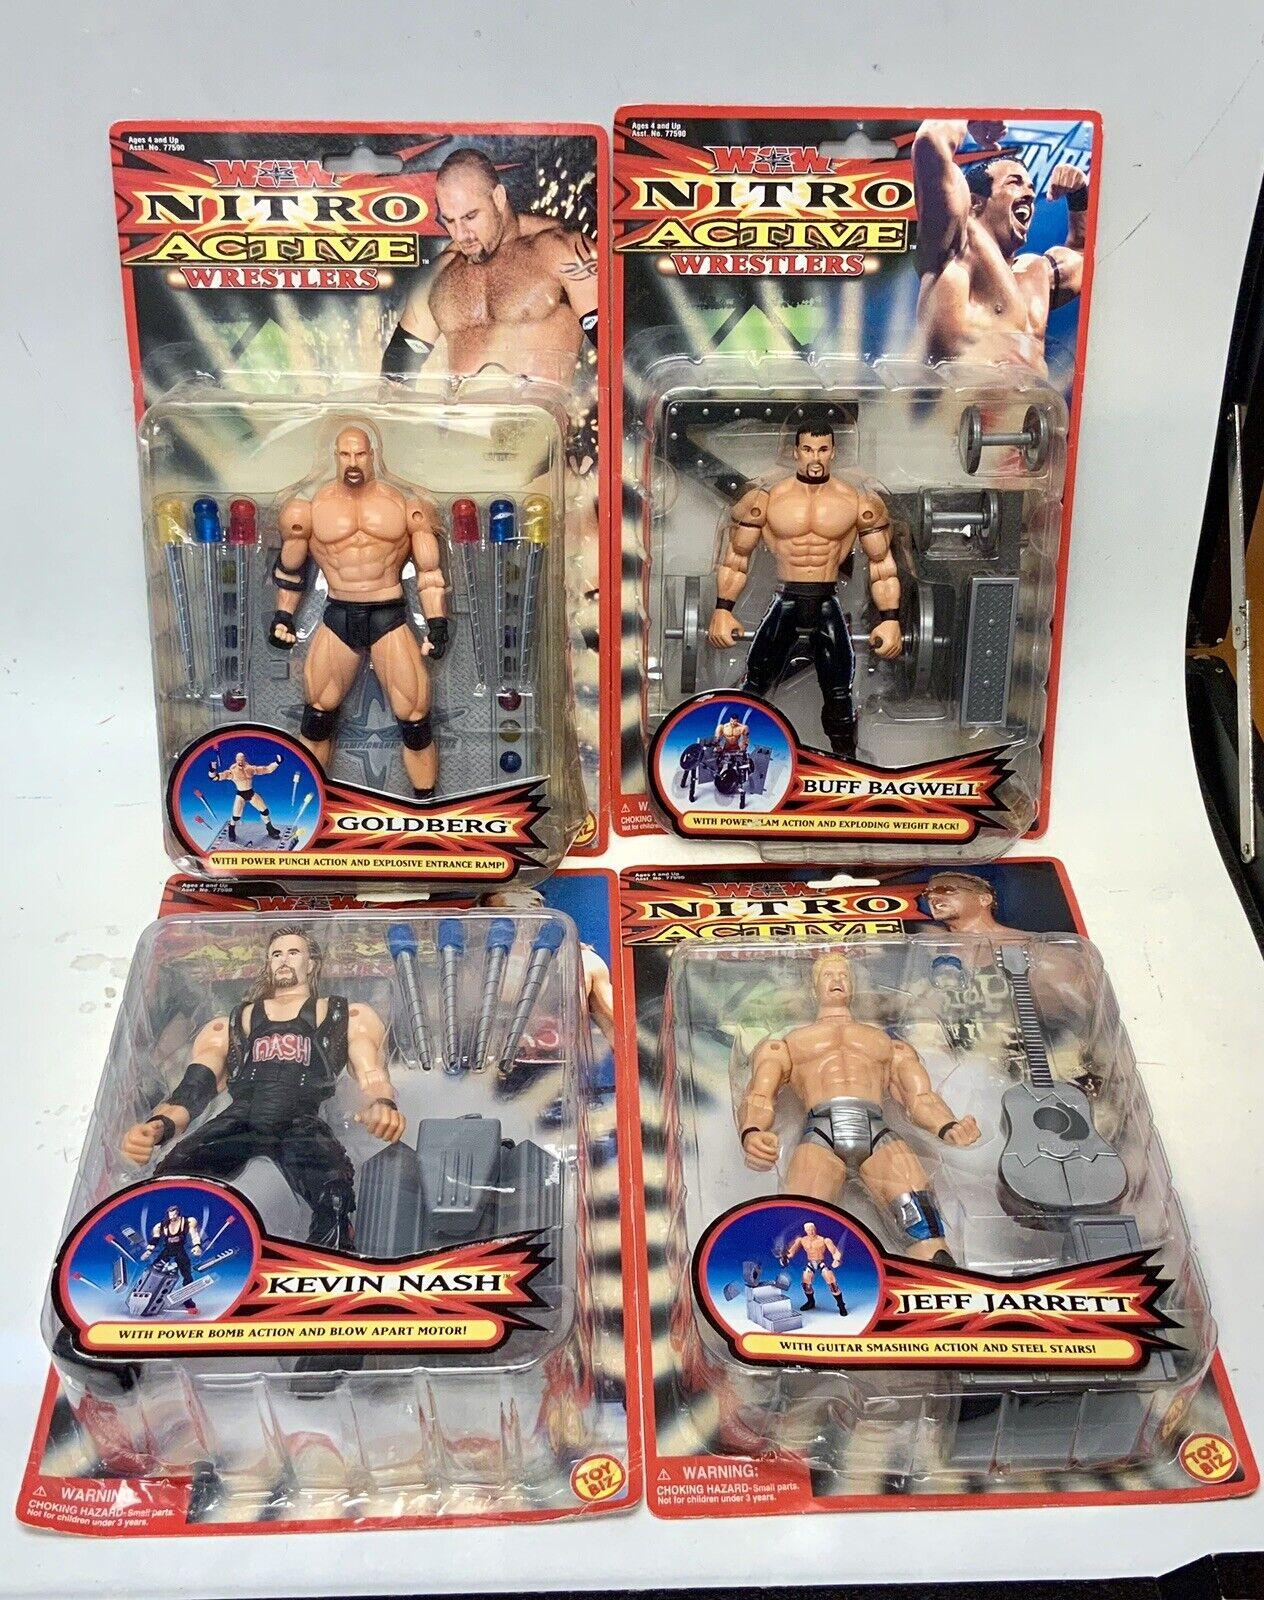 WCW Nitro Active Toy Biz Marvel Buff Bagwell goldberg Kevin Nash Jeff Jarrett